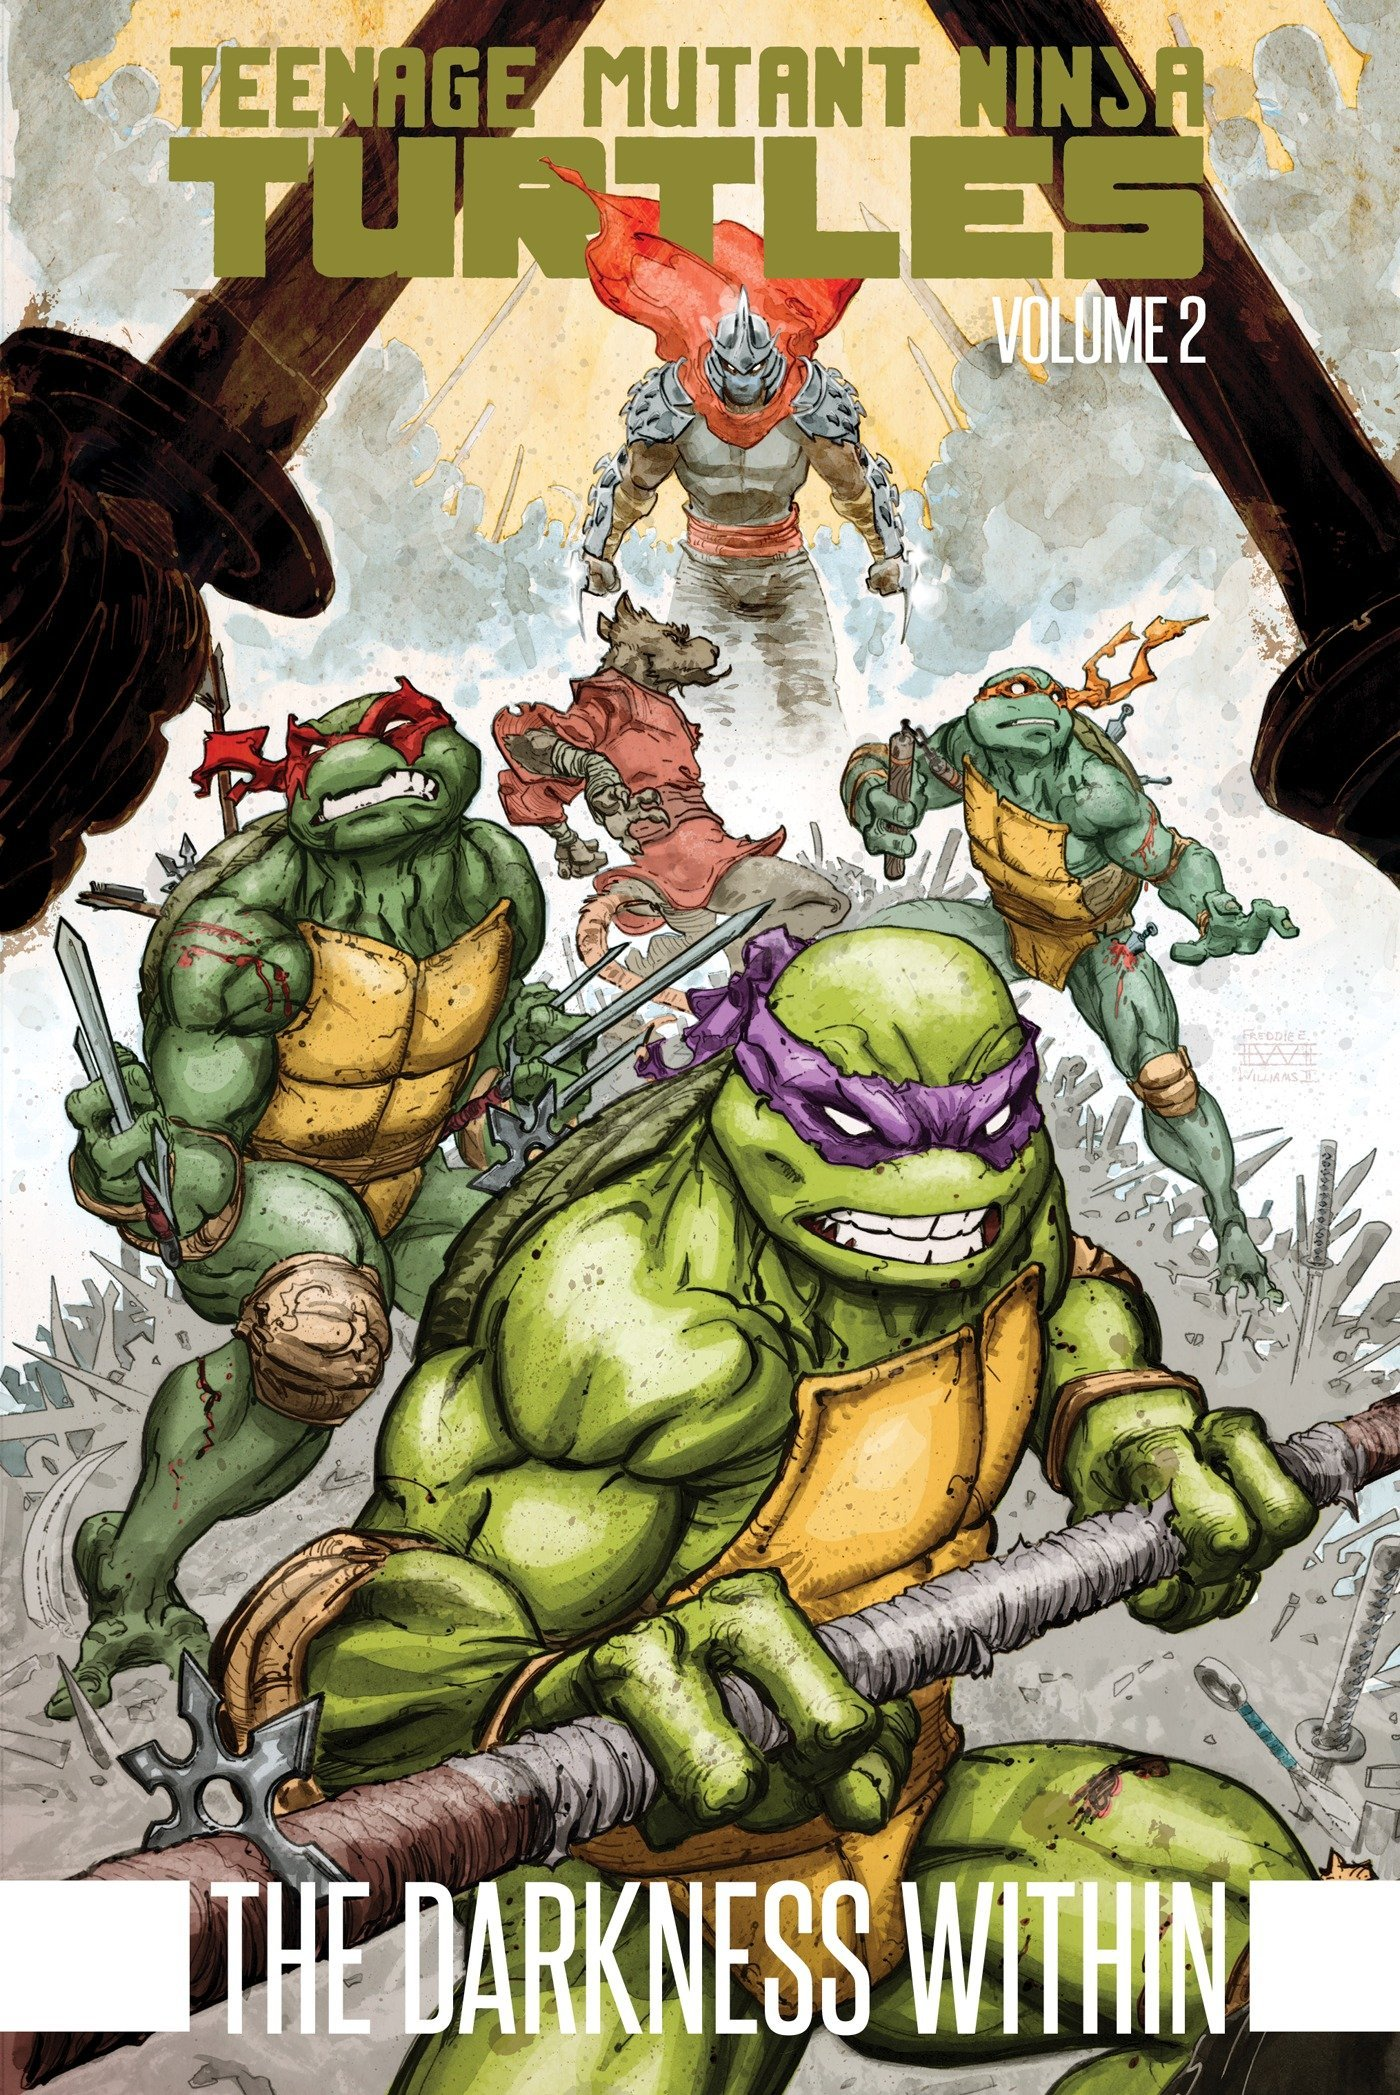 Teenage Mutant Ninja Turtles Volume 2: The Darkness Within ...